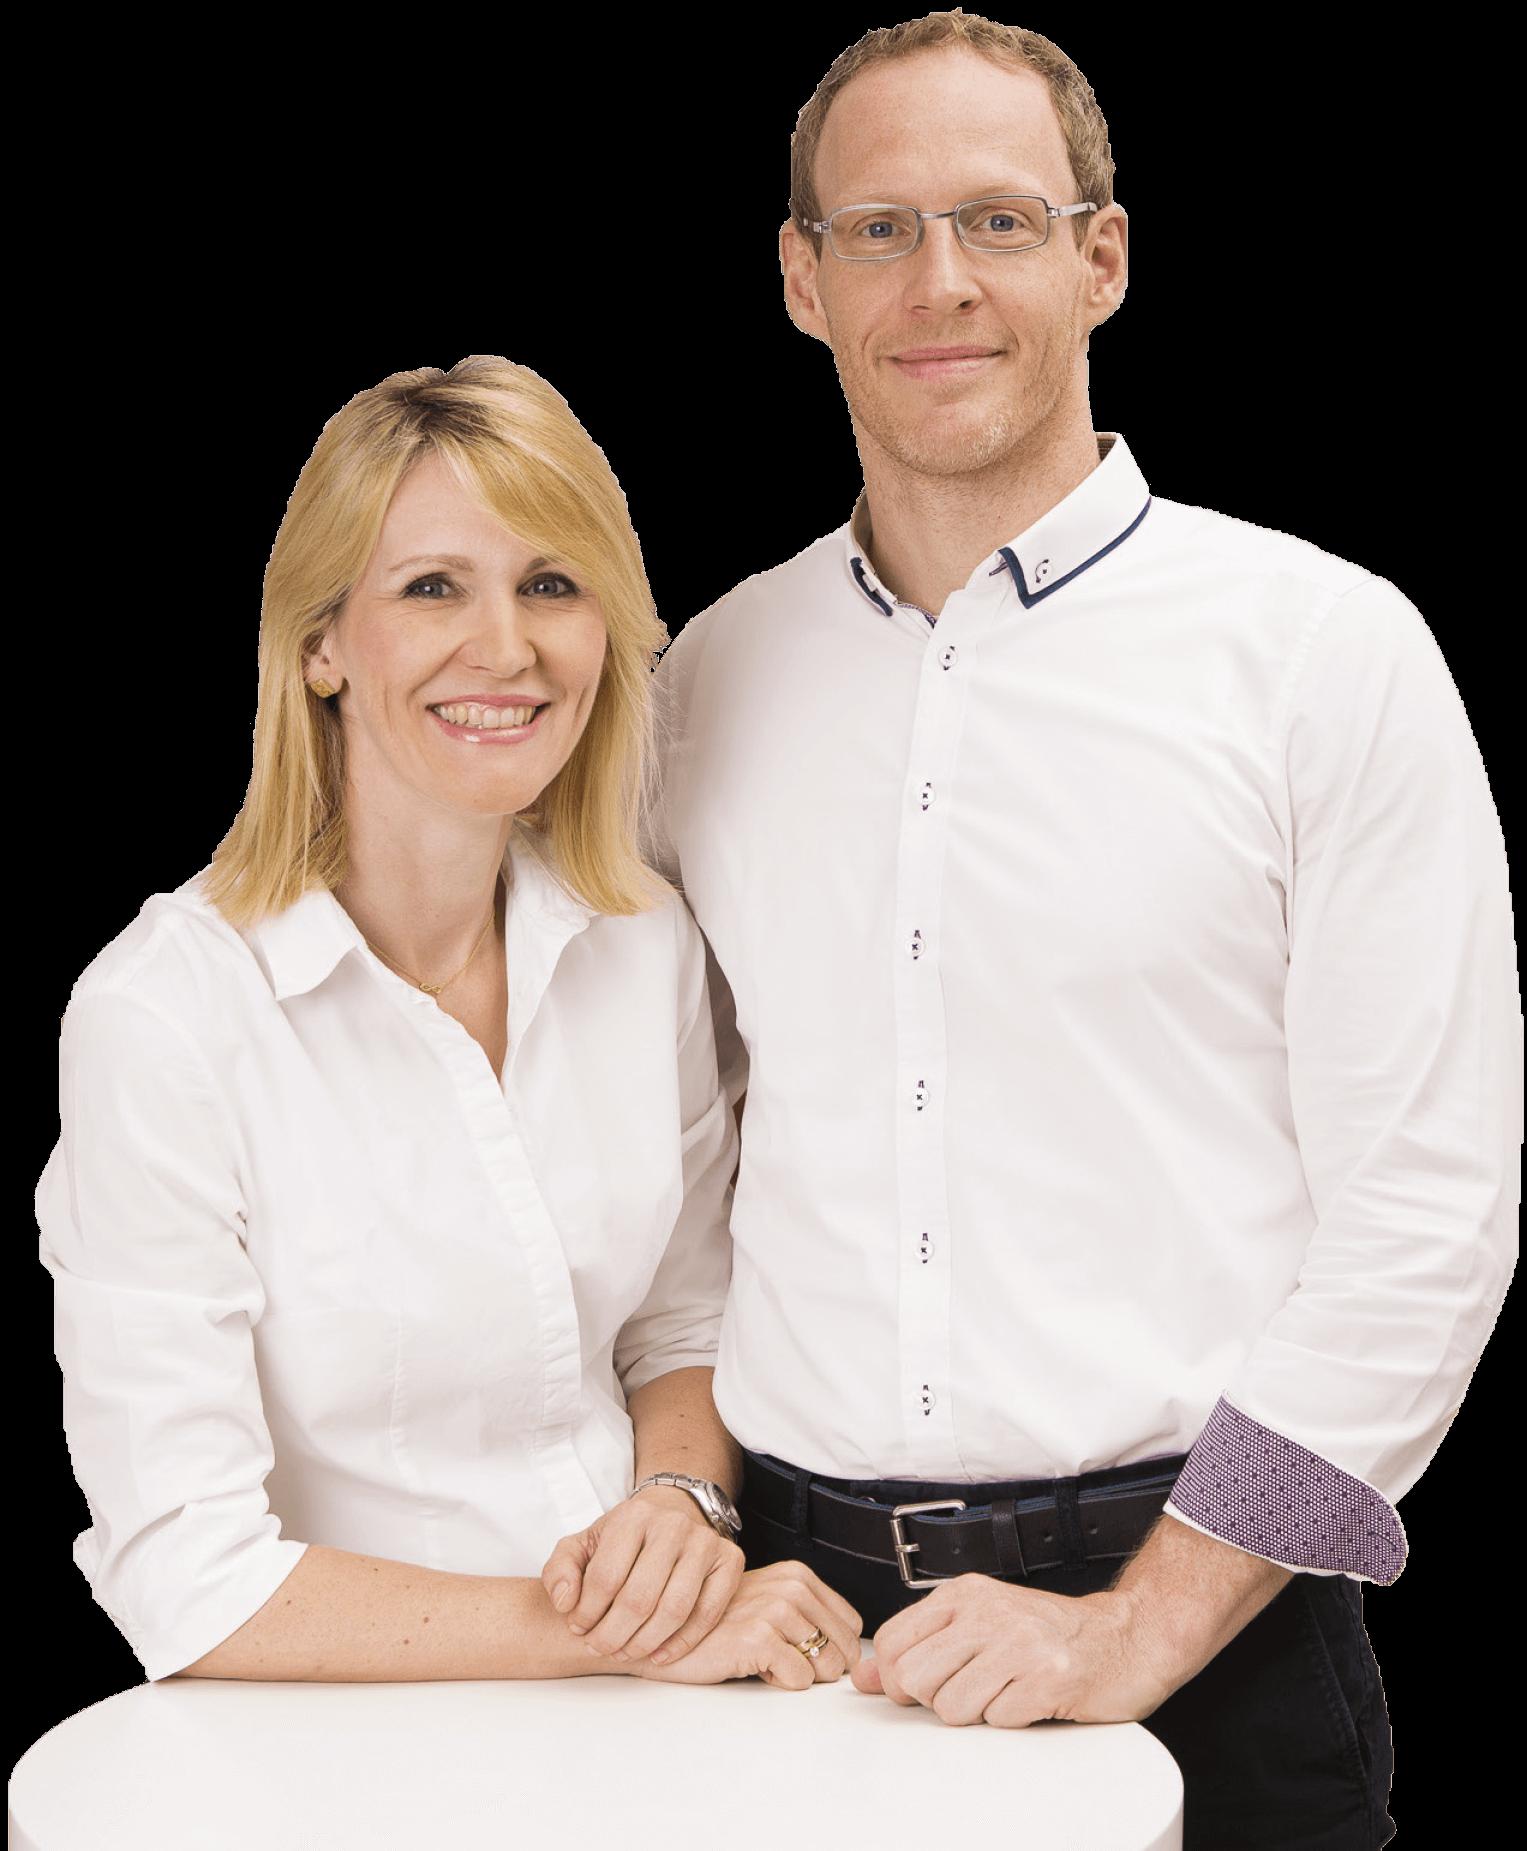 Dr. Matthias Kiefl und Dr. Eva-Maria Kiefl-Christ Koala Straubing